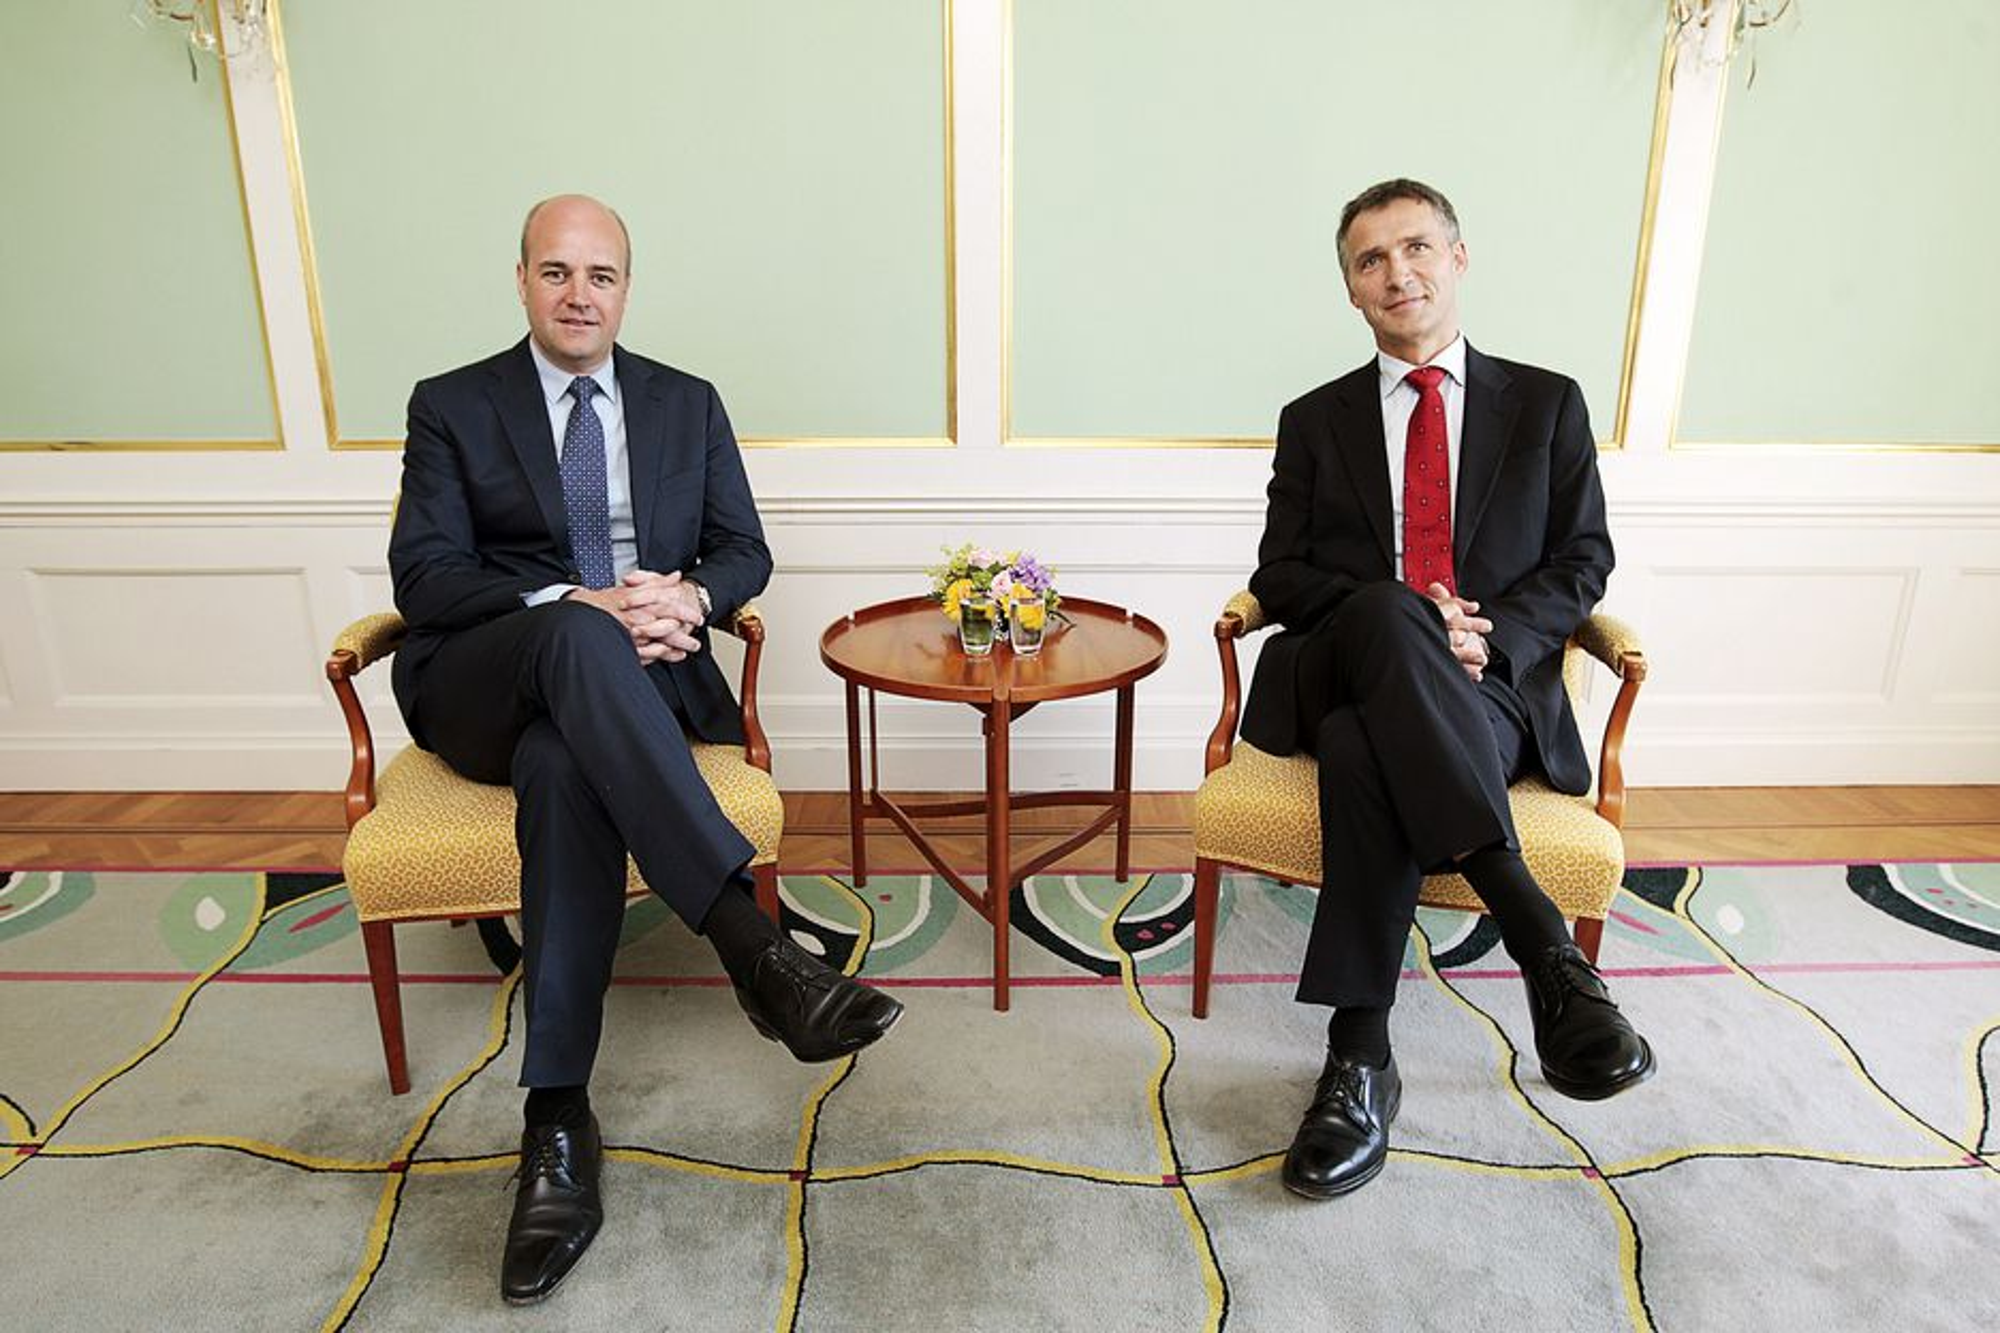 Måndagen den 22 juni träffade statsminister Fredrik Reinfeldt Norges statsminister Jens Stoltenberg.